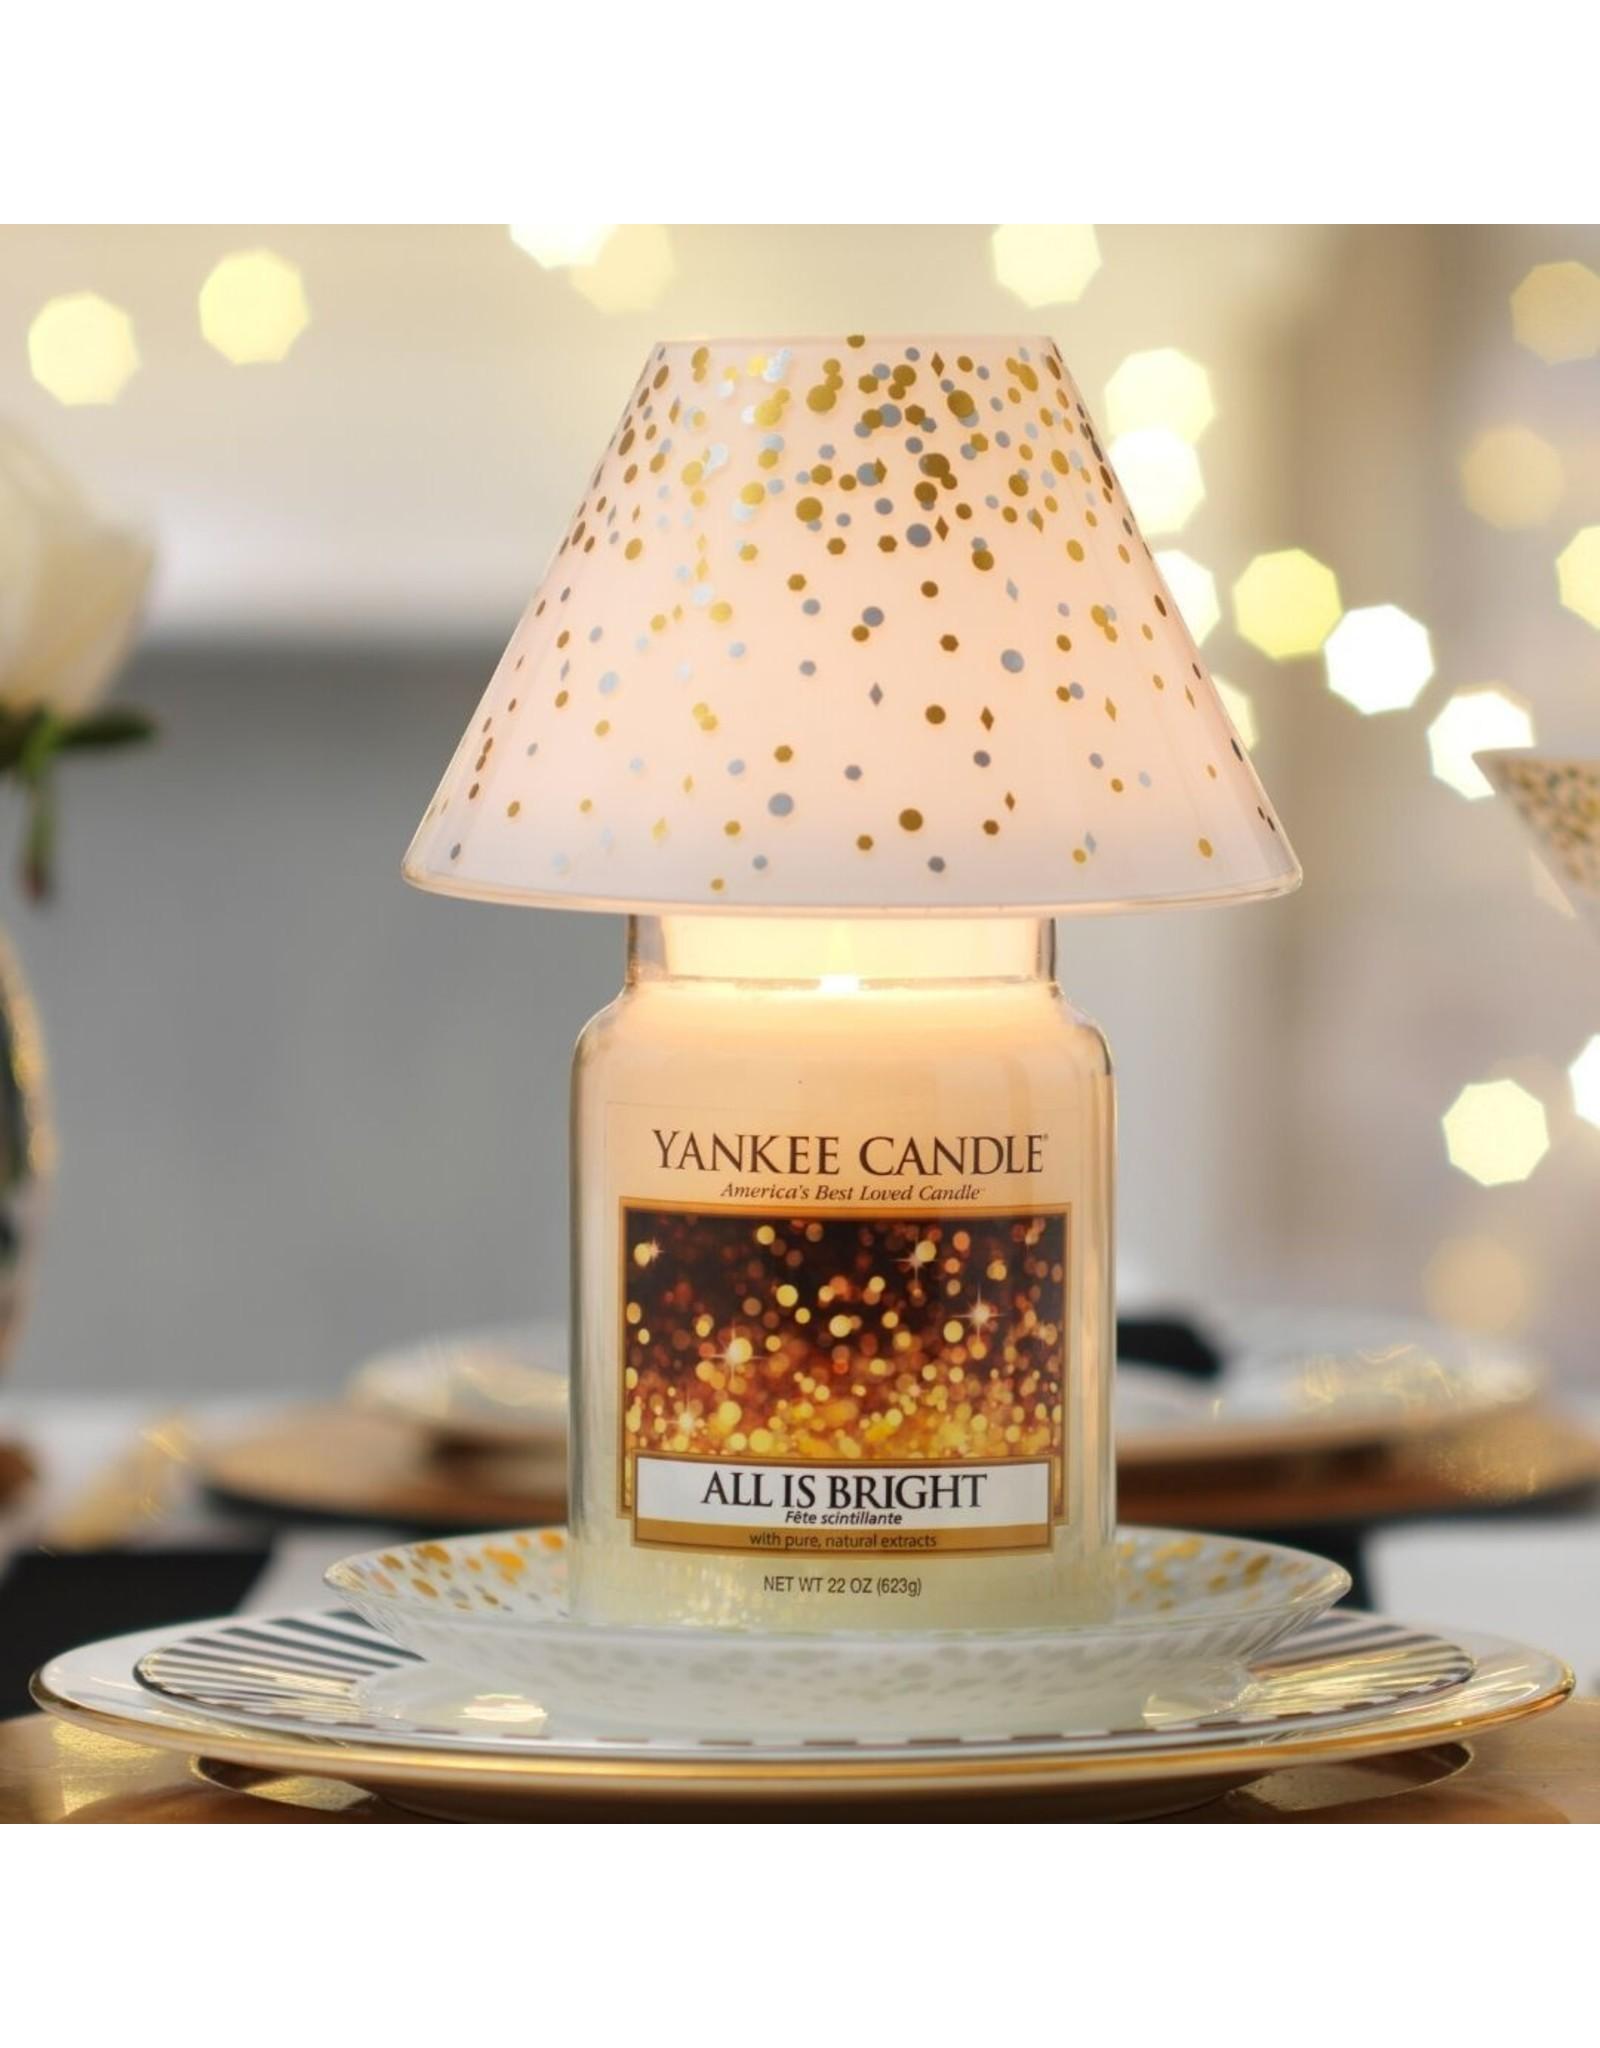 Yankee Candle Holiday Party - Large Shade & Tray